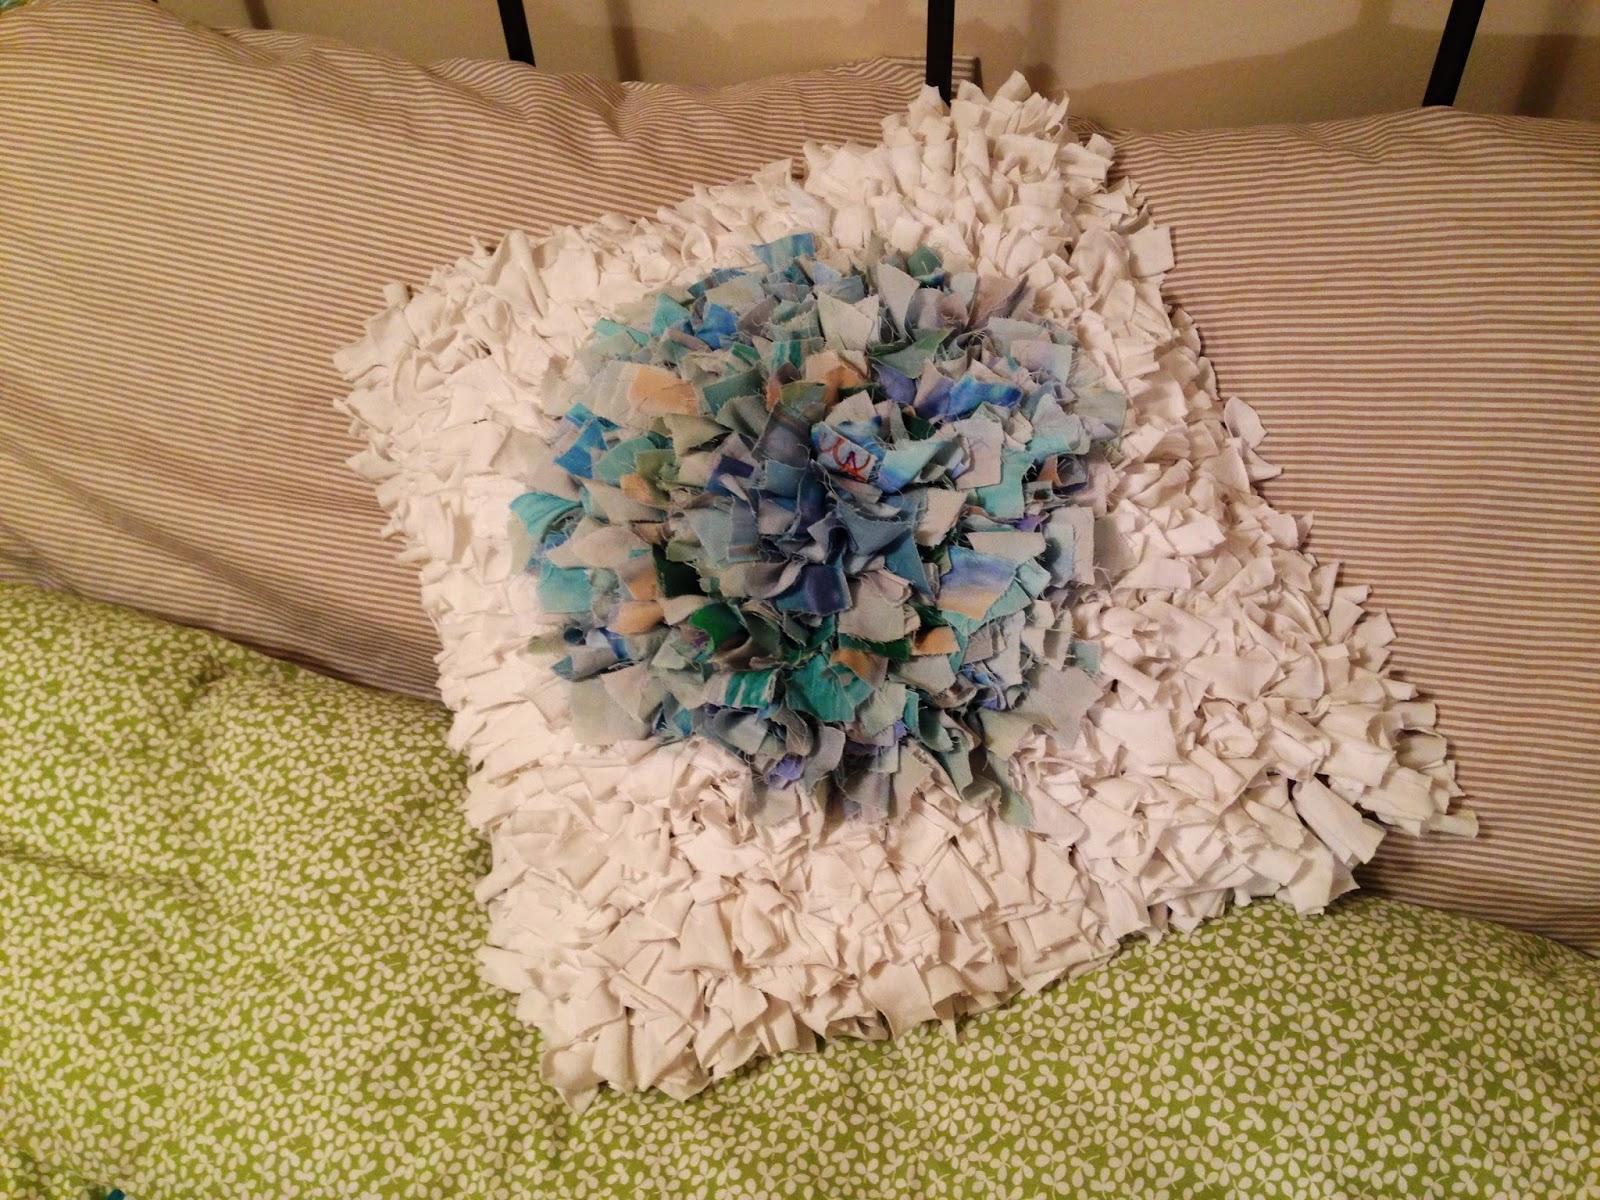 Hattie S Haberdashery Rag Rug Cushion